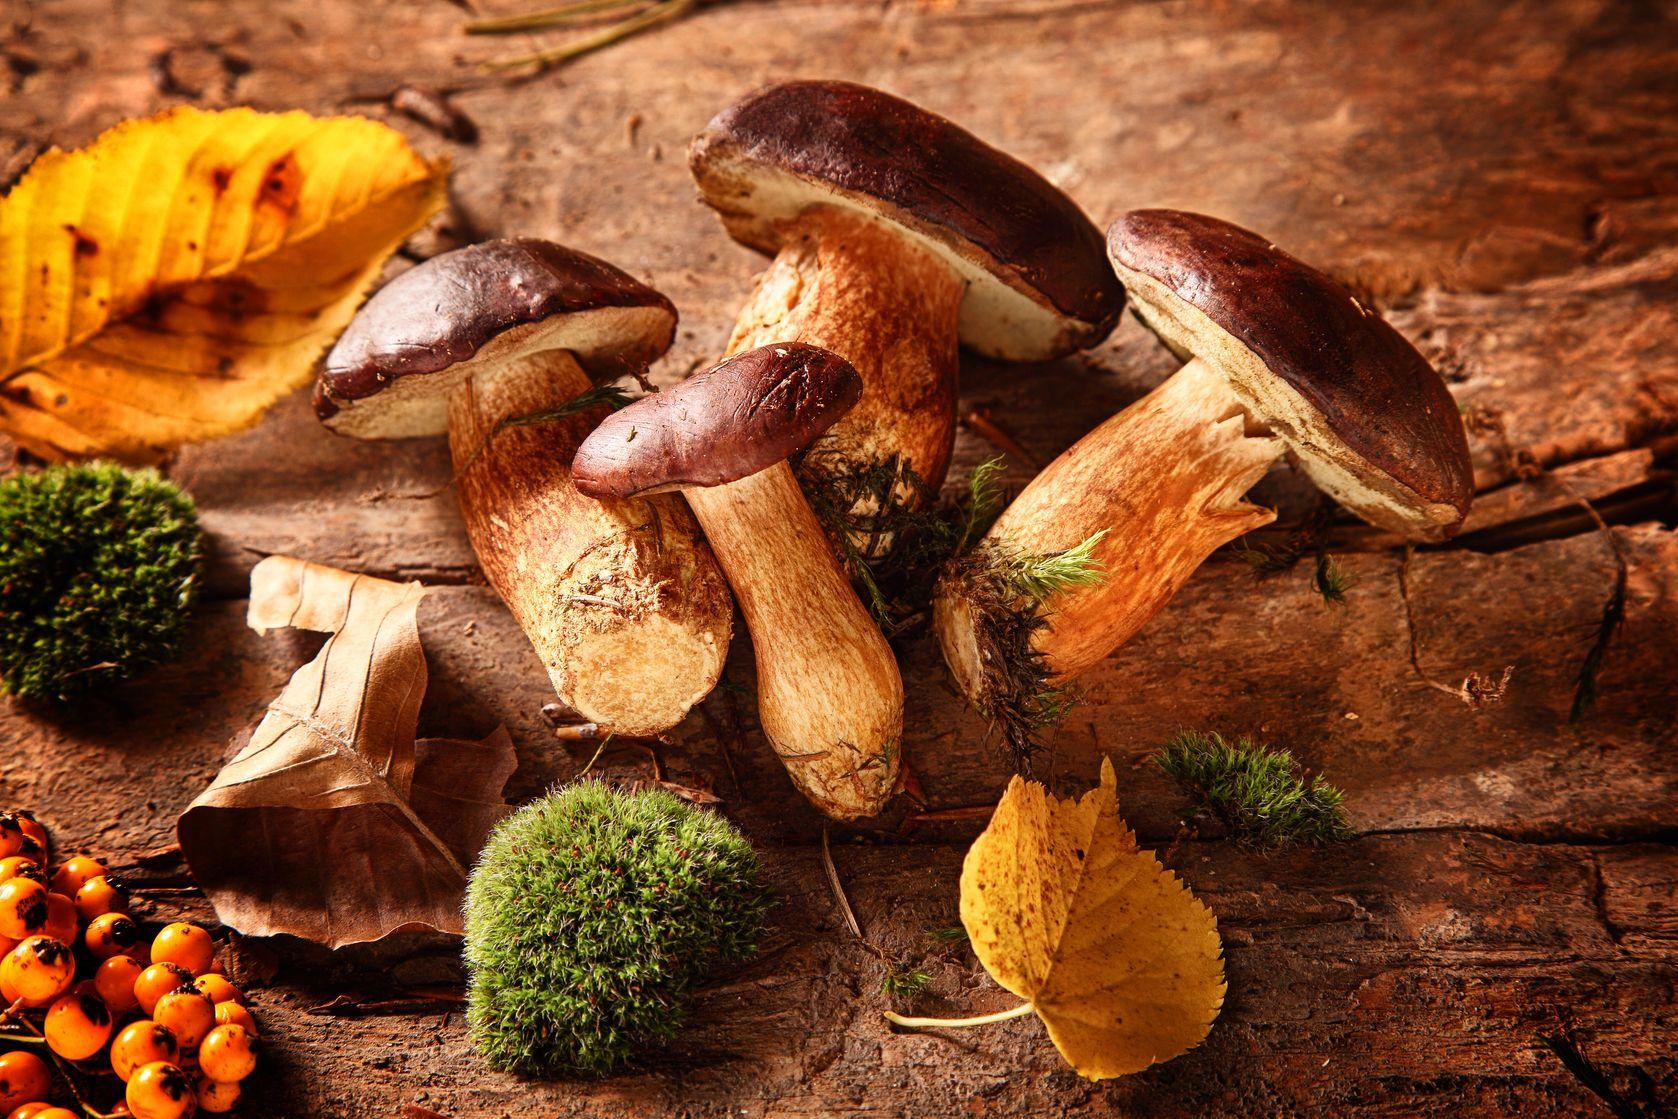 Cerstve-lesni-houby | foodandmore/123RF.com